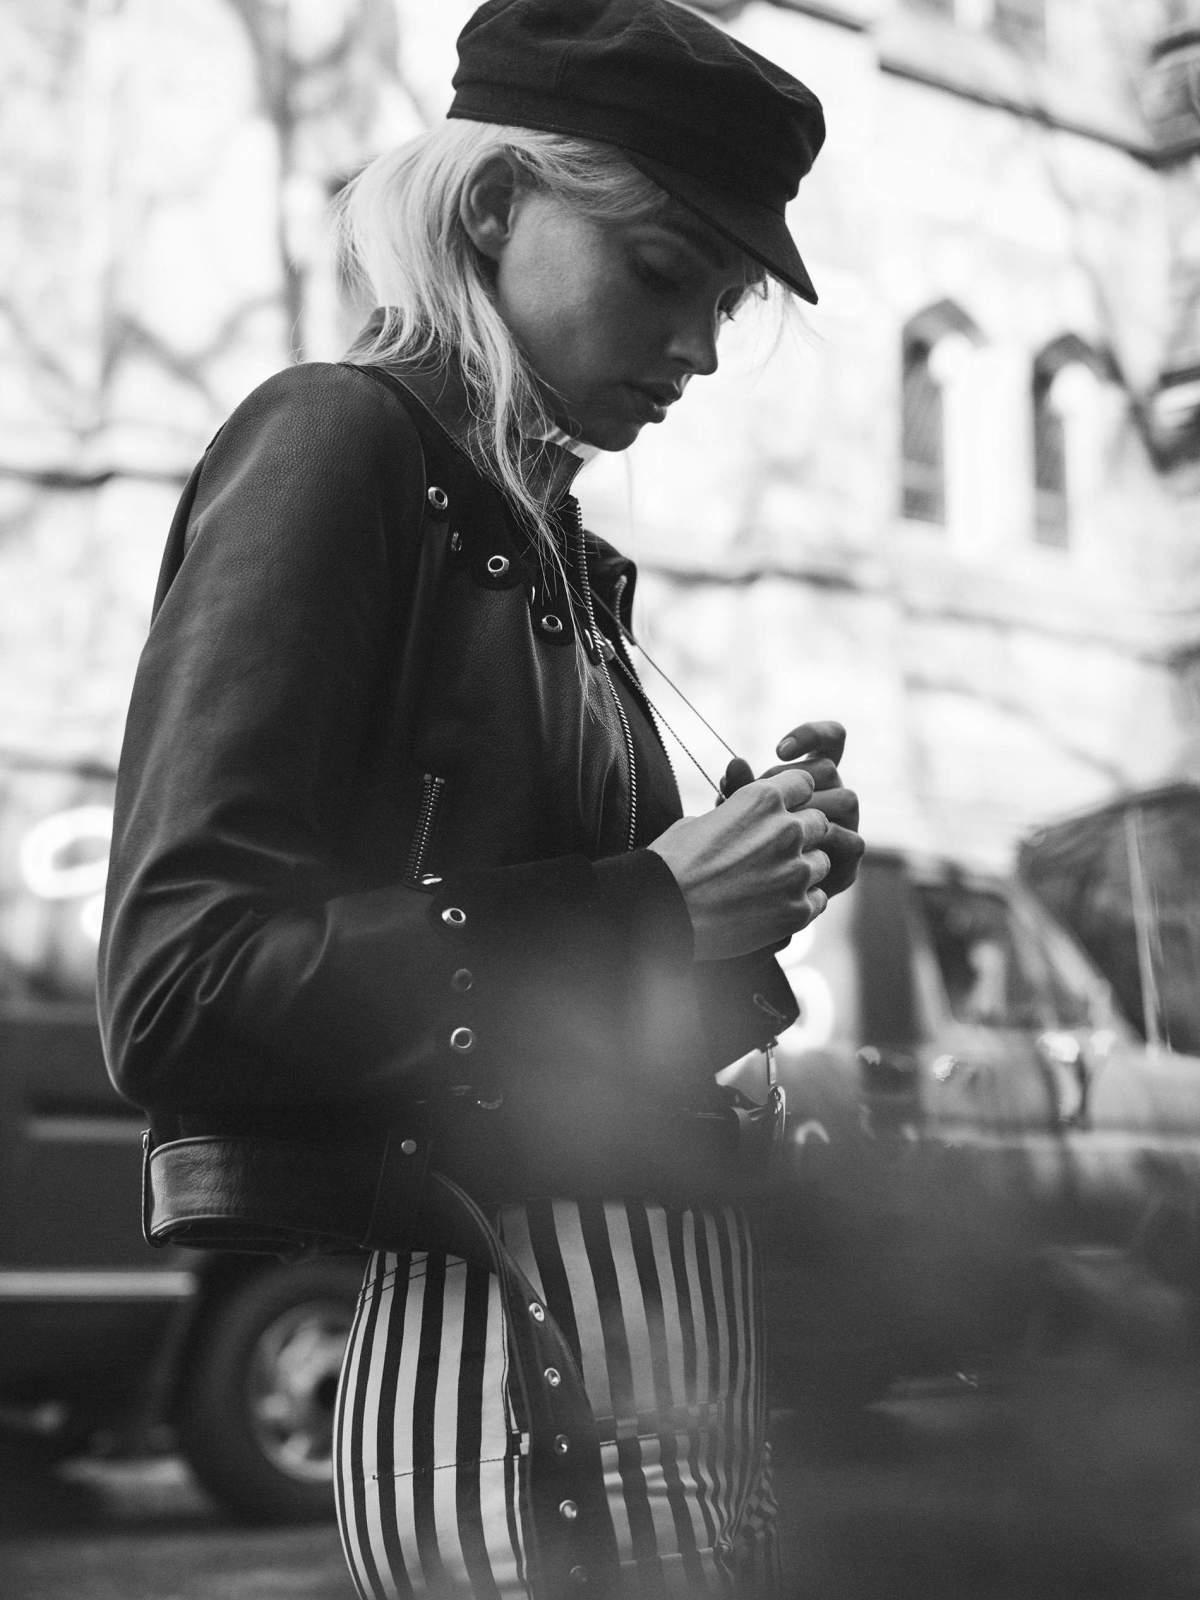 Elsa Hosk by Stefano Galuzzi for Porter Edit